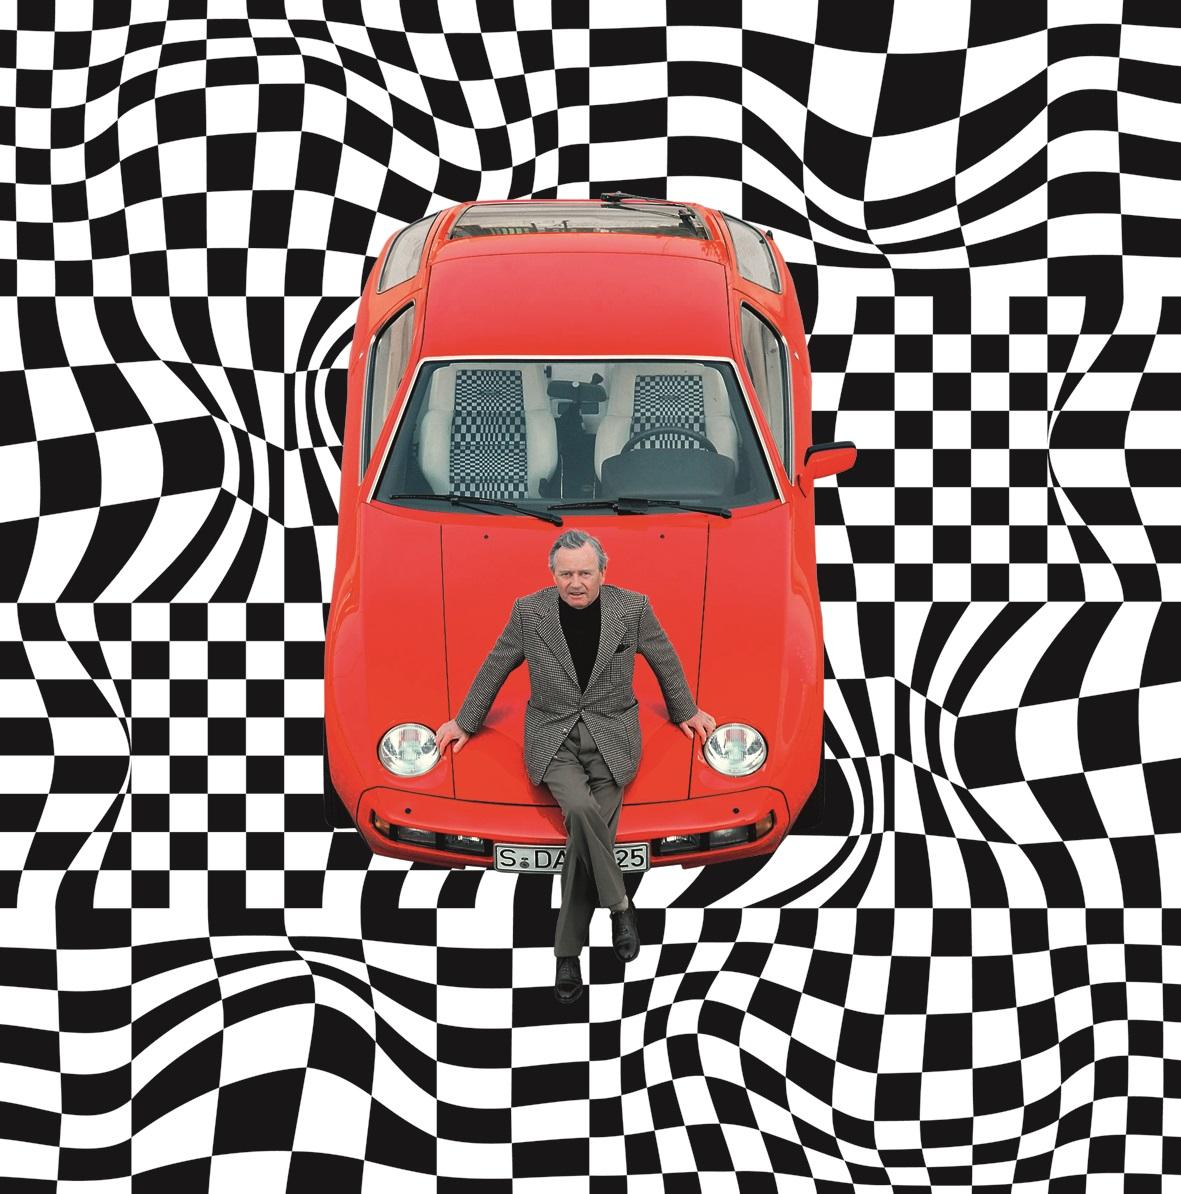 Porsche Everyday Dedeporsches Blog